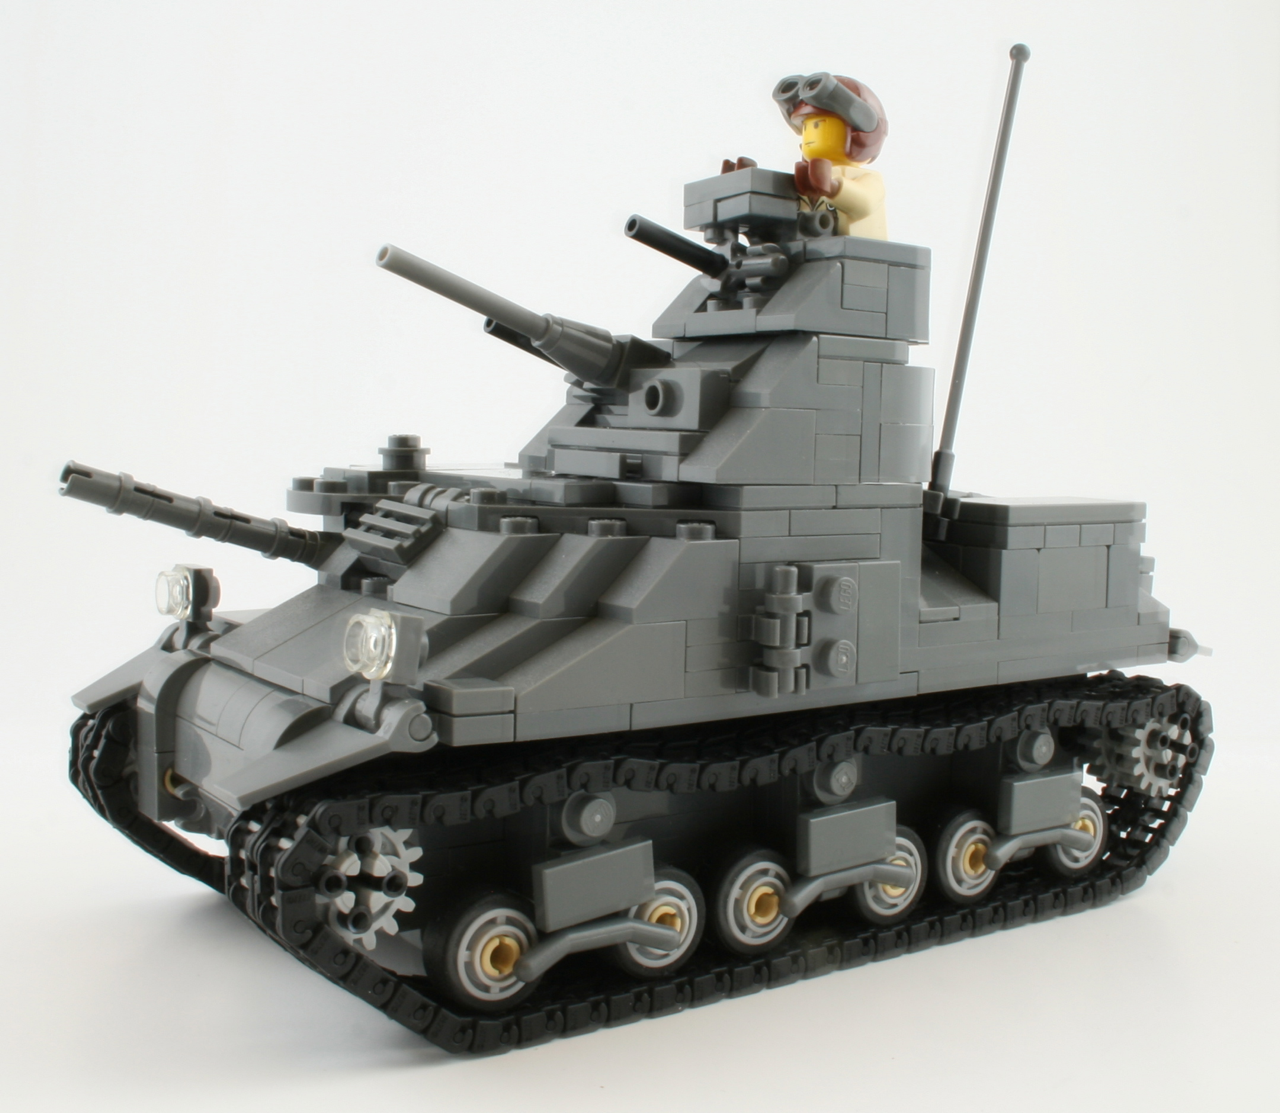 M3 Lee Medium Tank Prototype Model Preview Brickmania Blog